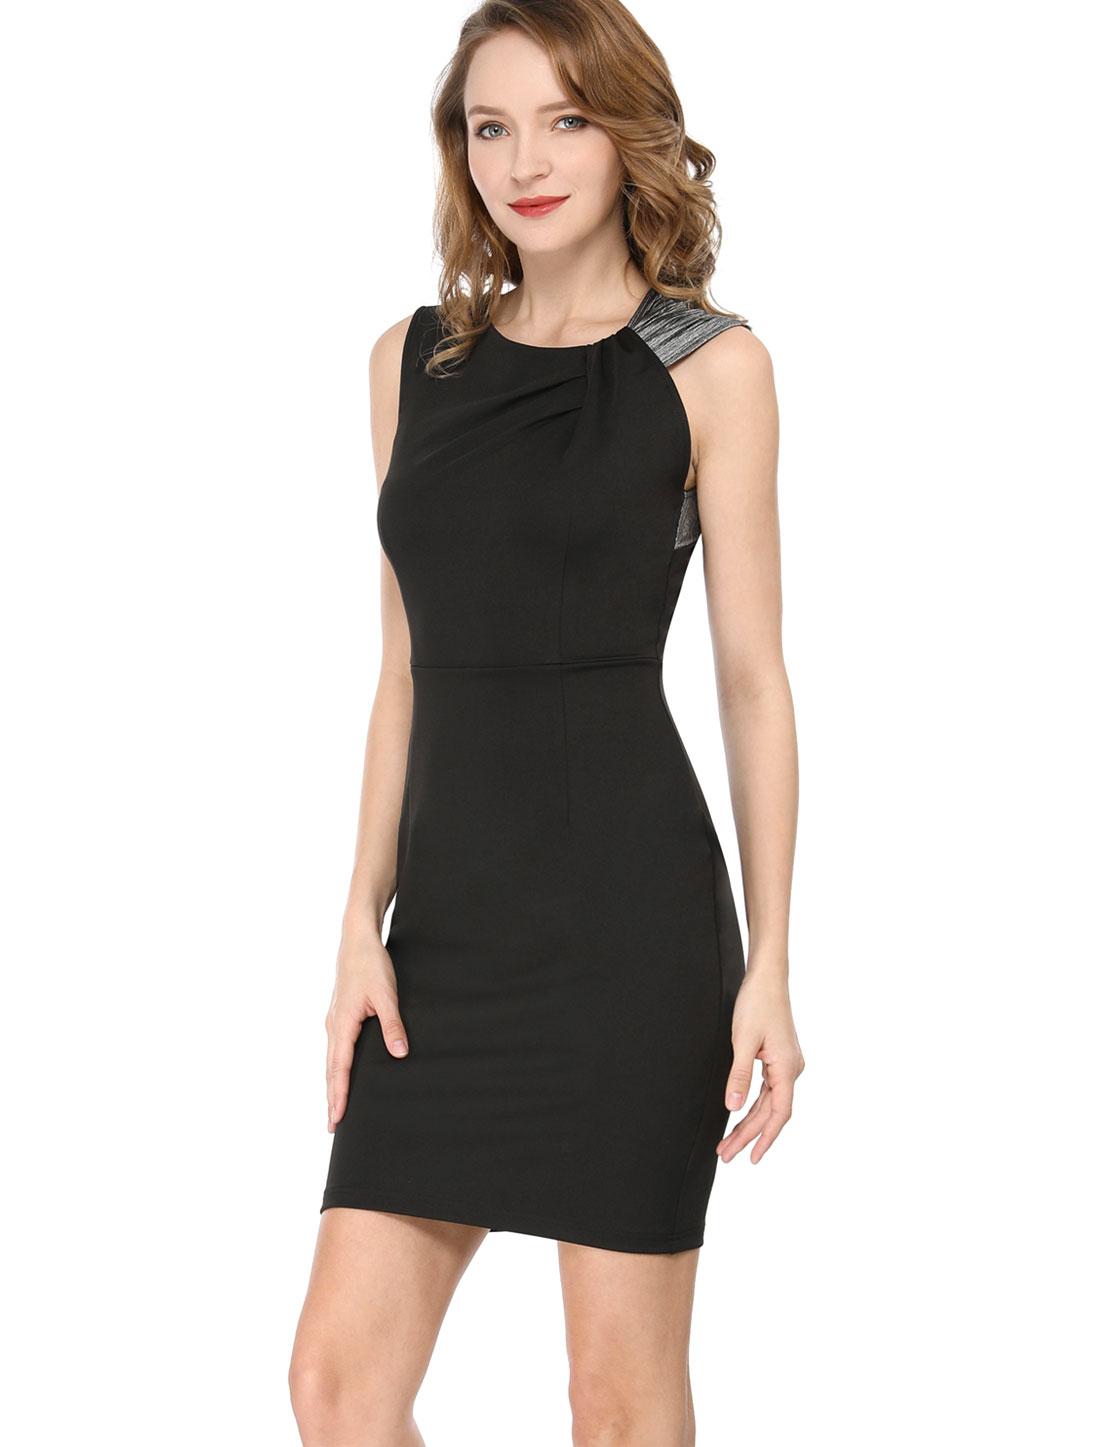 Allegra K Women's Metallic Shiny Shoulder Party Sheath Dress Black XS